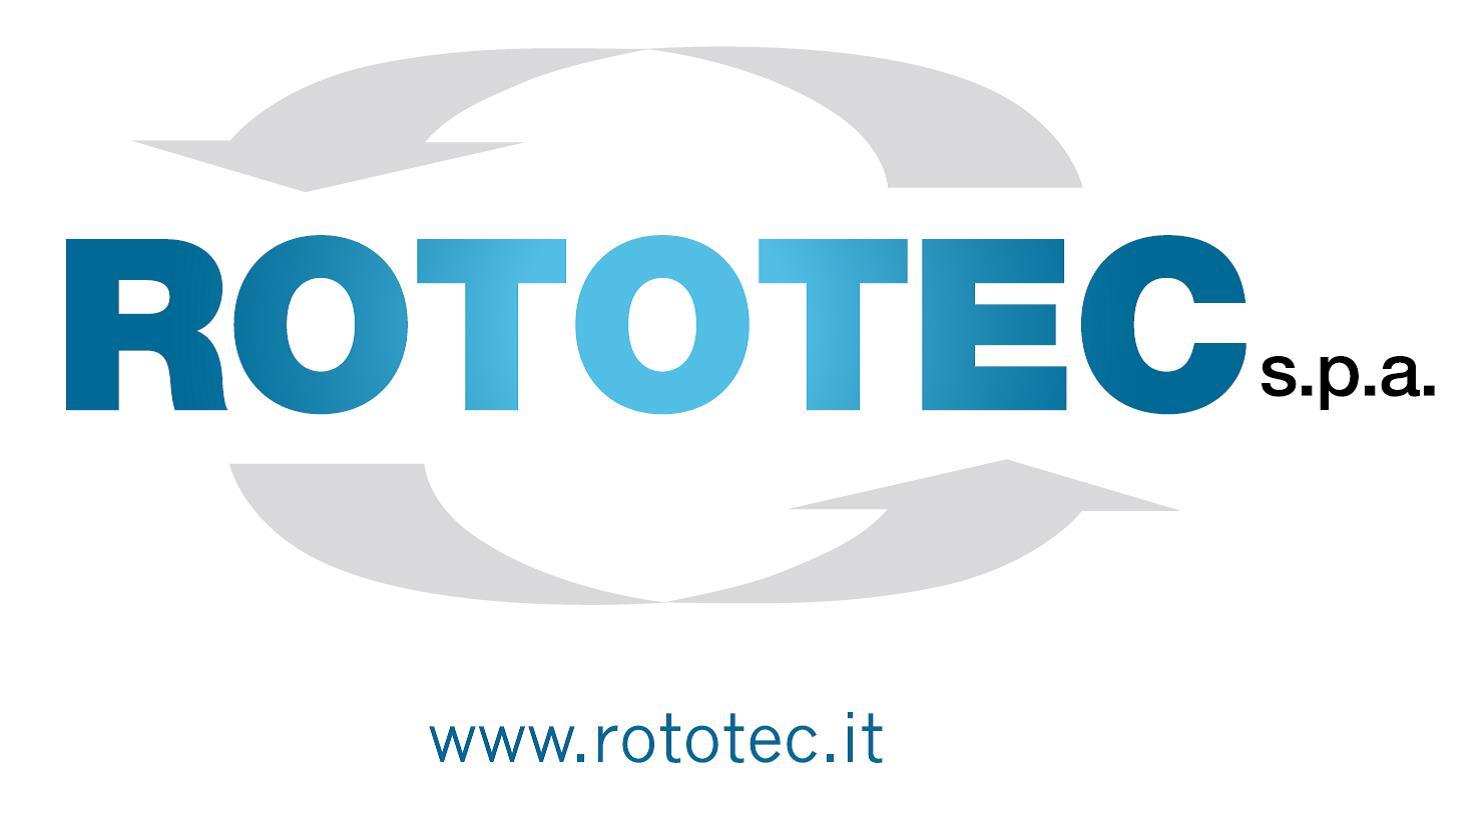 Immagine ROTOTEC